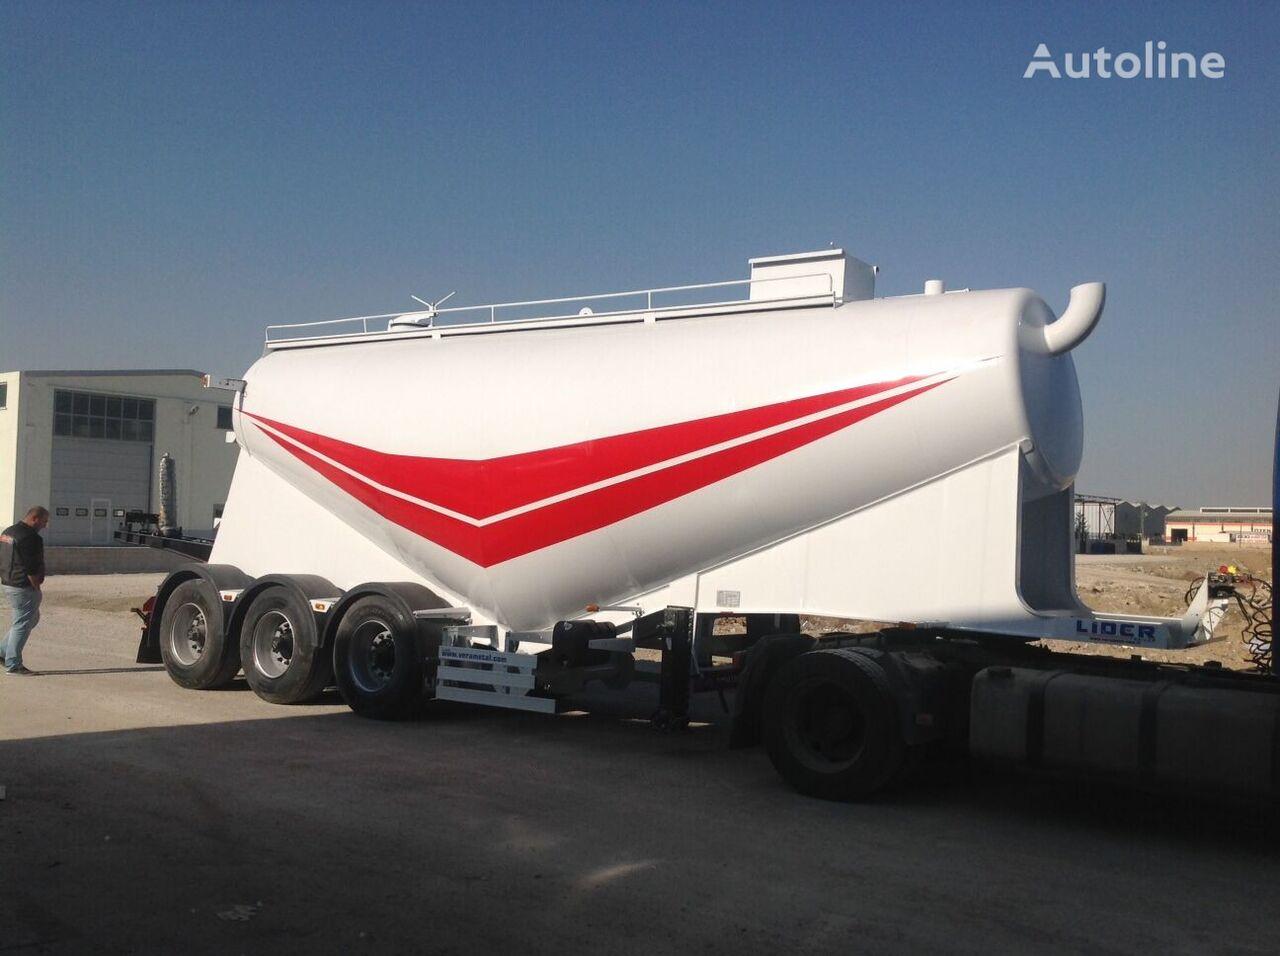 nový cisterna pro přepravu cementu LIDER 2020 year new Slurry Tanker Farmer  Agriculture Field Tanker